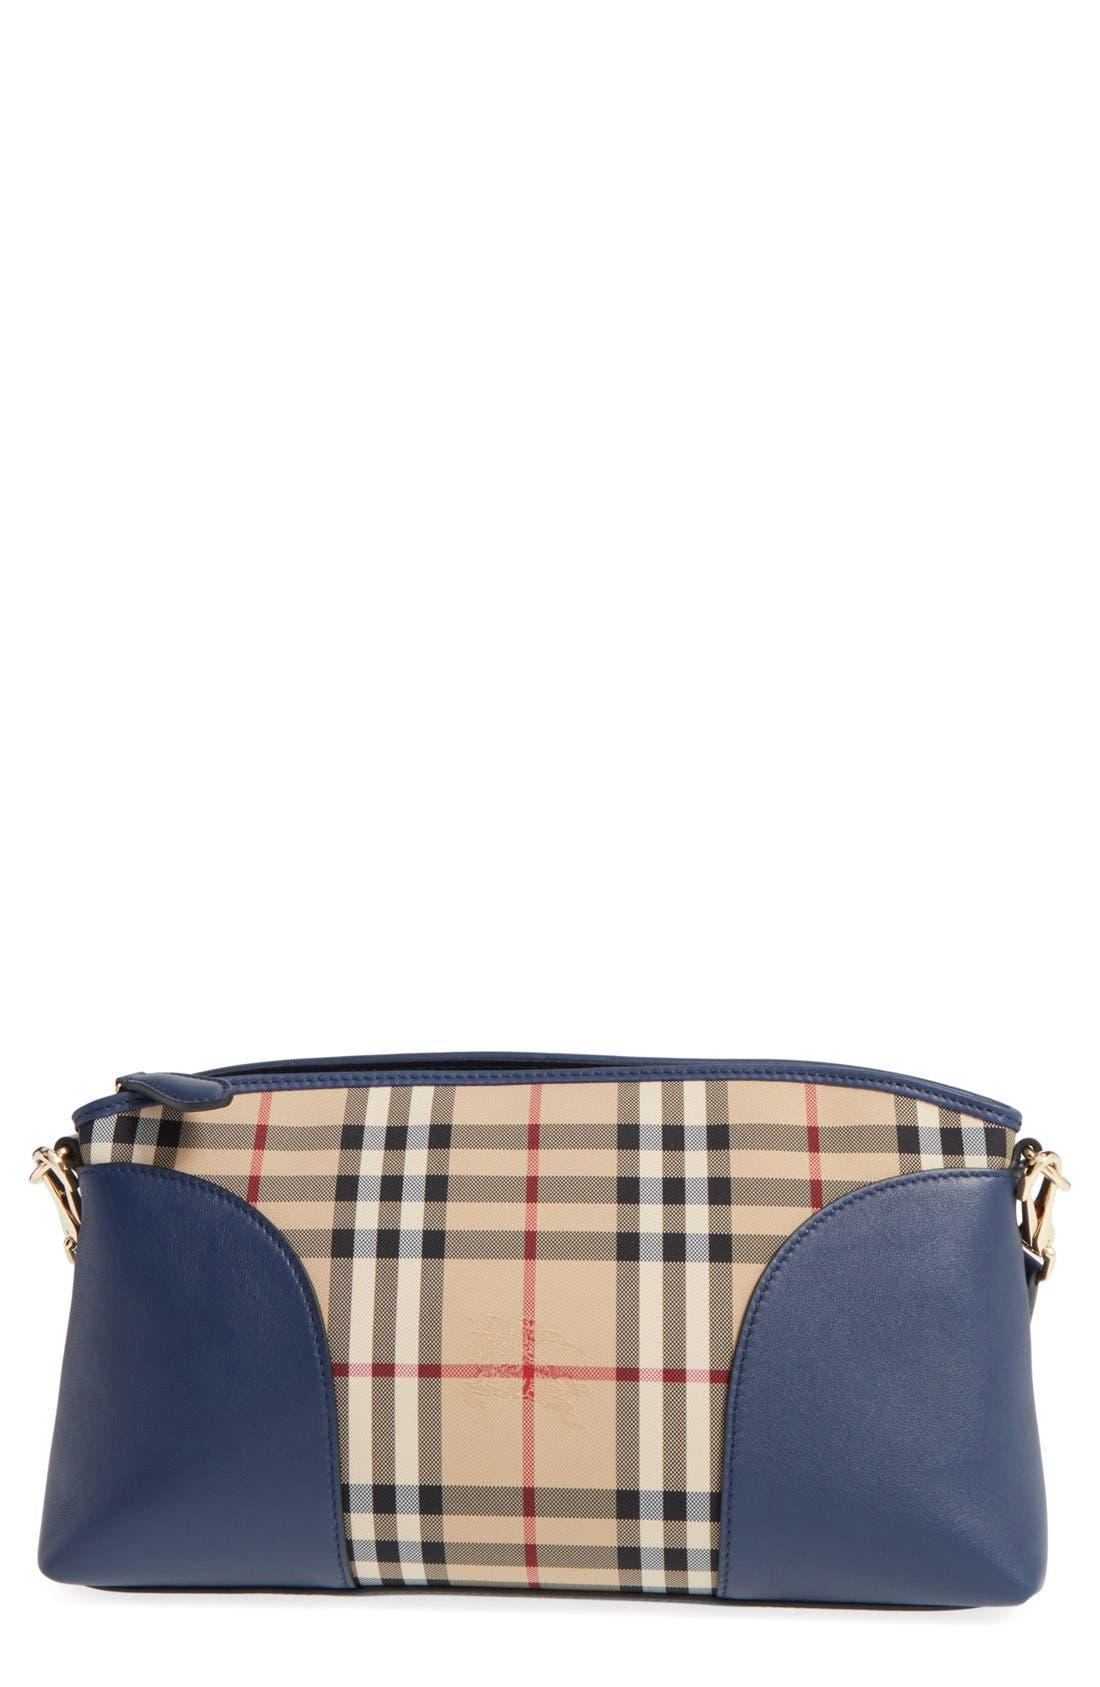 BURBERRY 'Horseferry Chichester' Leather & Nylon Crossbody Bag